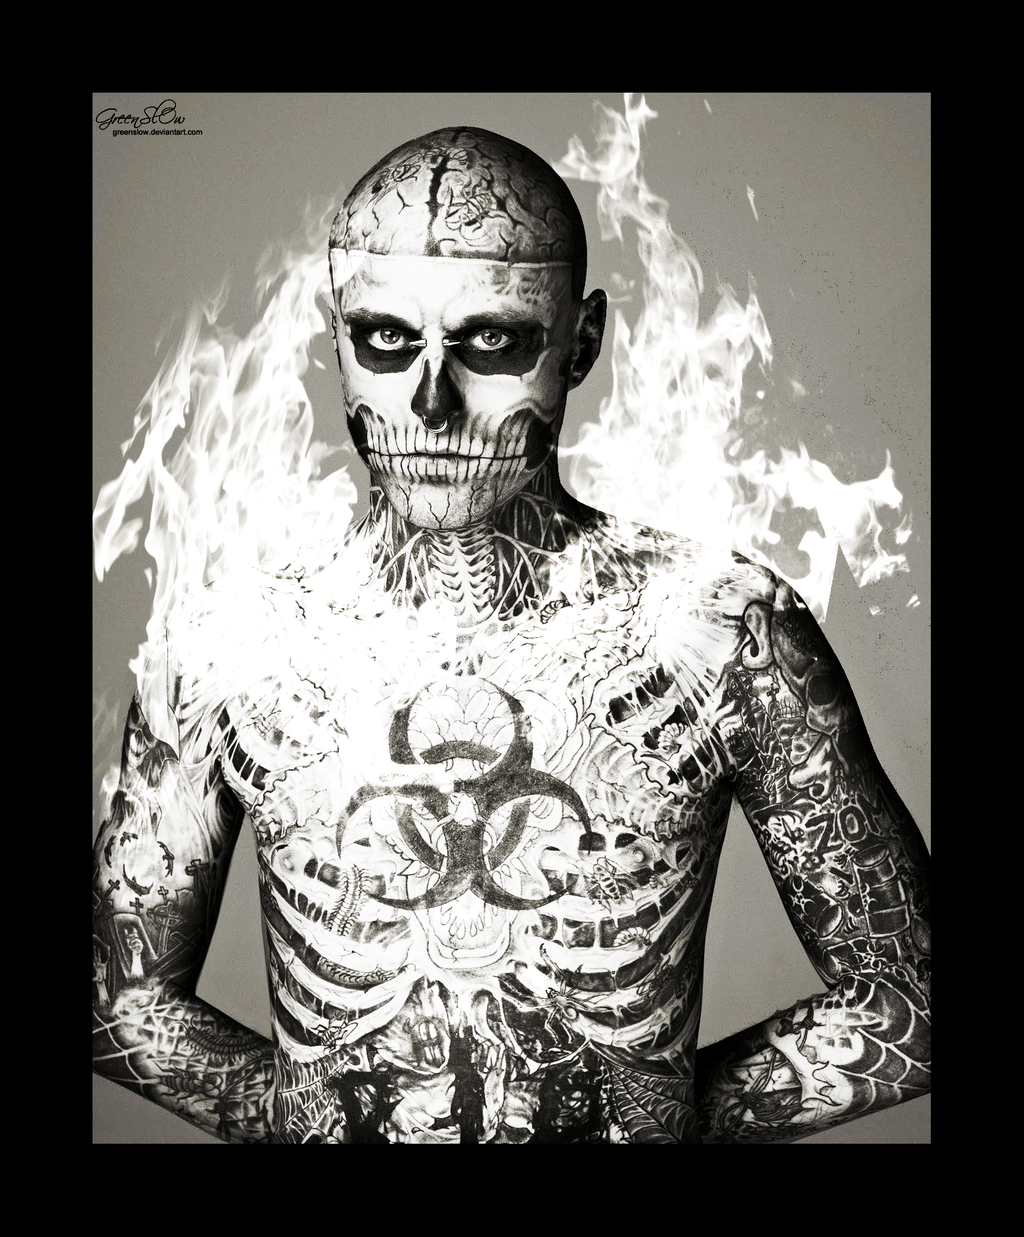 Фото парня с татуировкой скелета